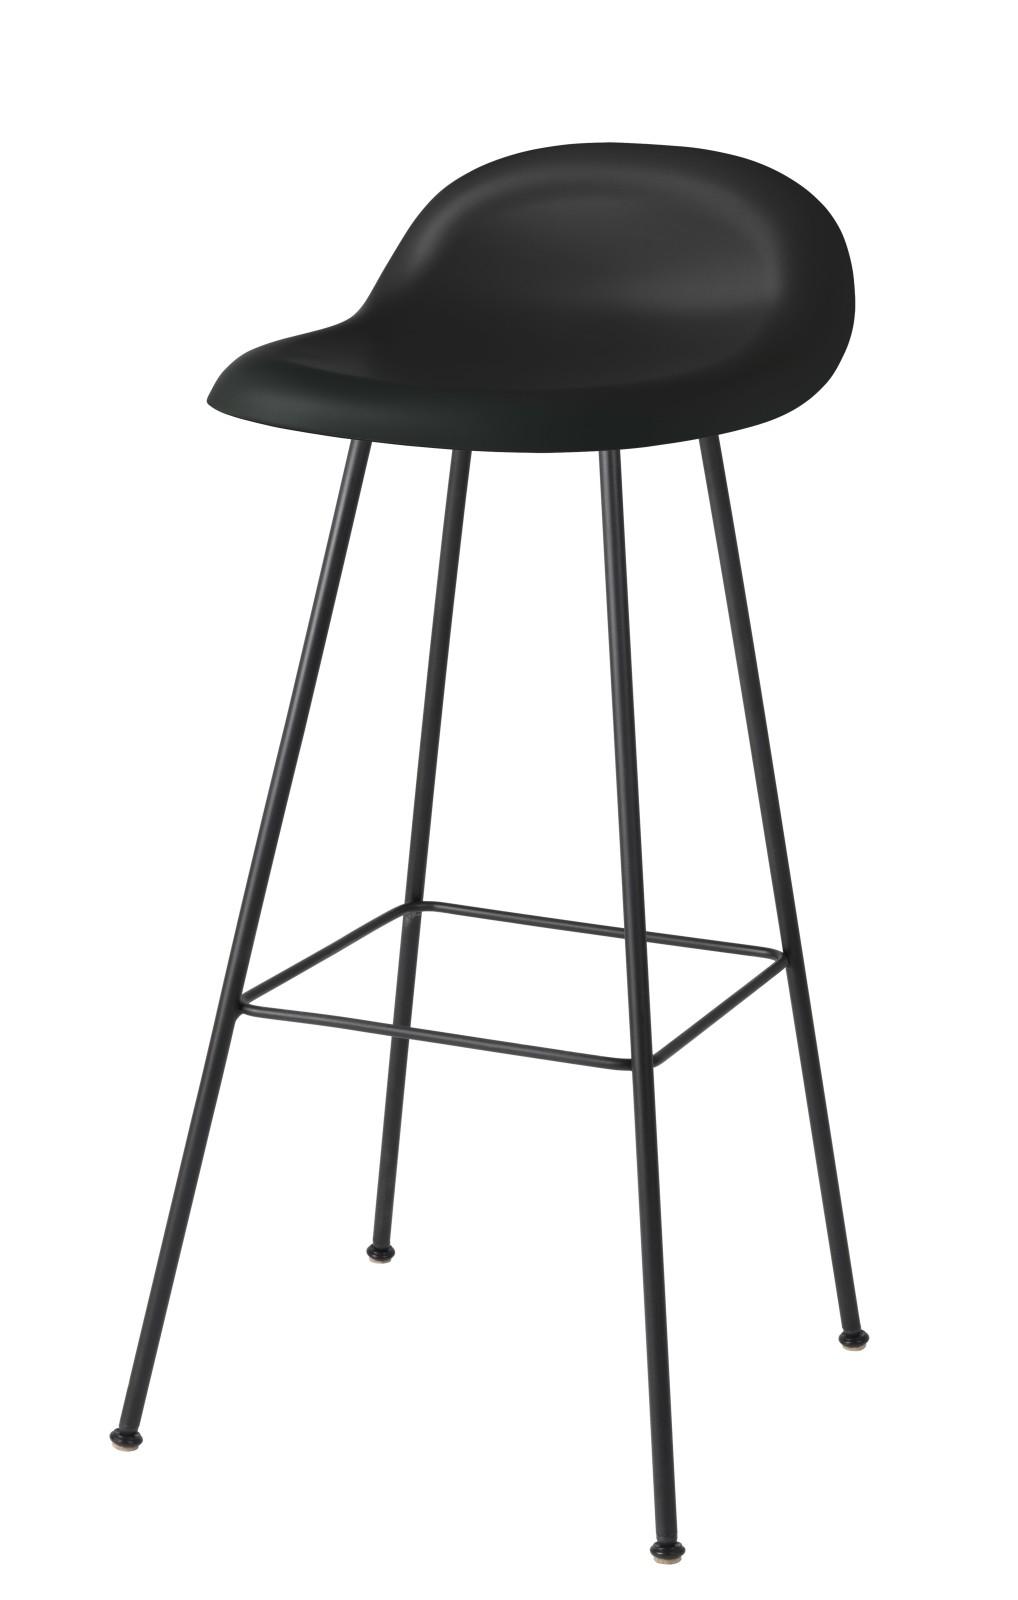 Gubi 3D Bar Stool Center Base - Unupholstered Gubi HiRek Black